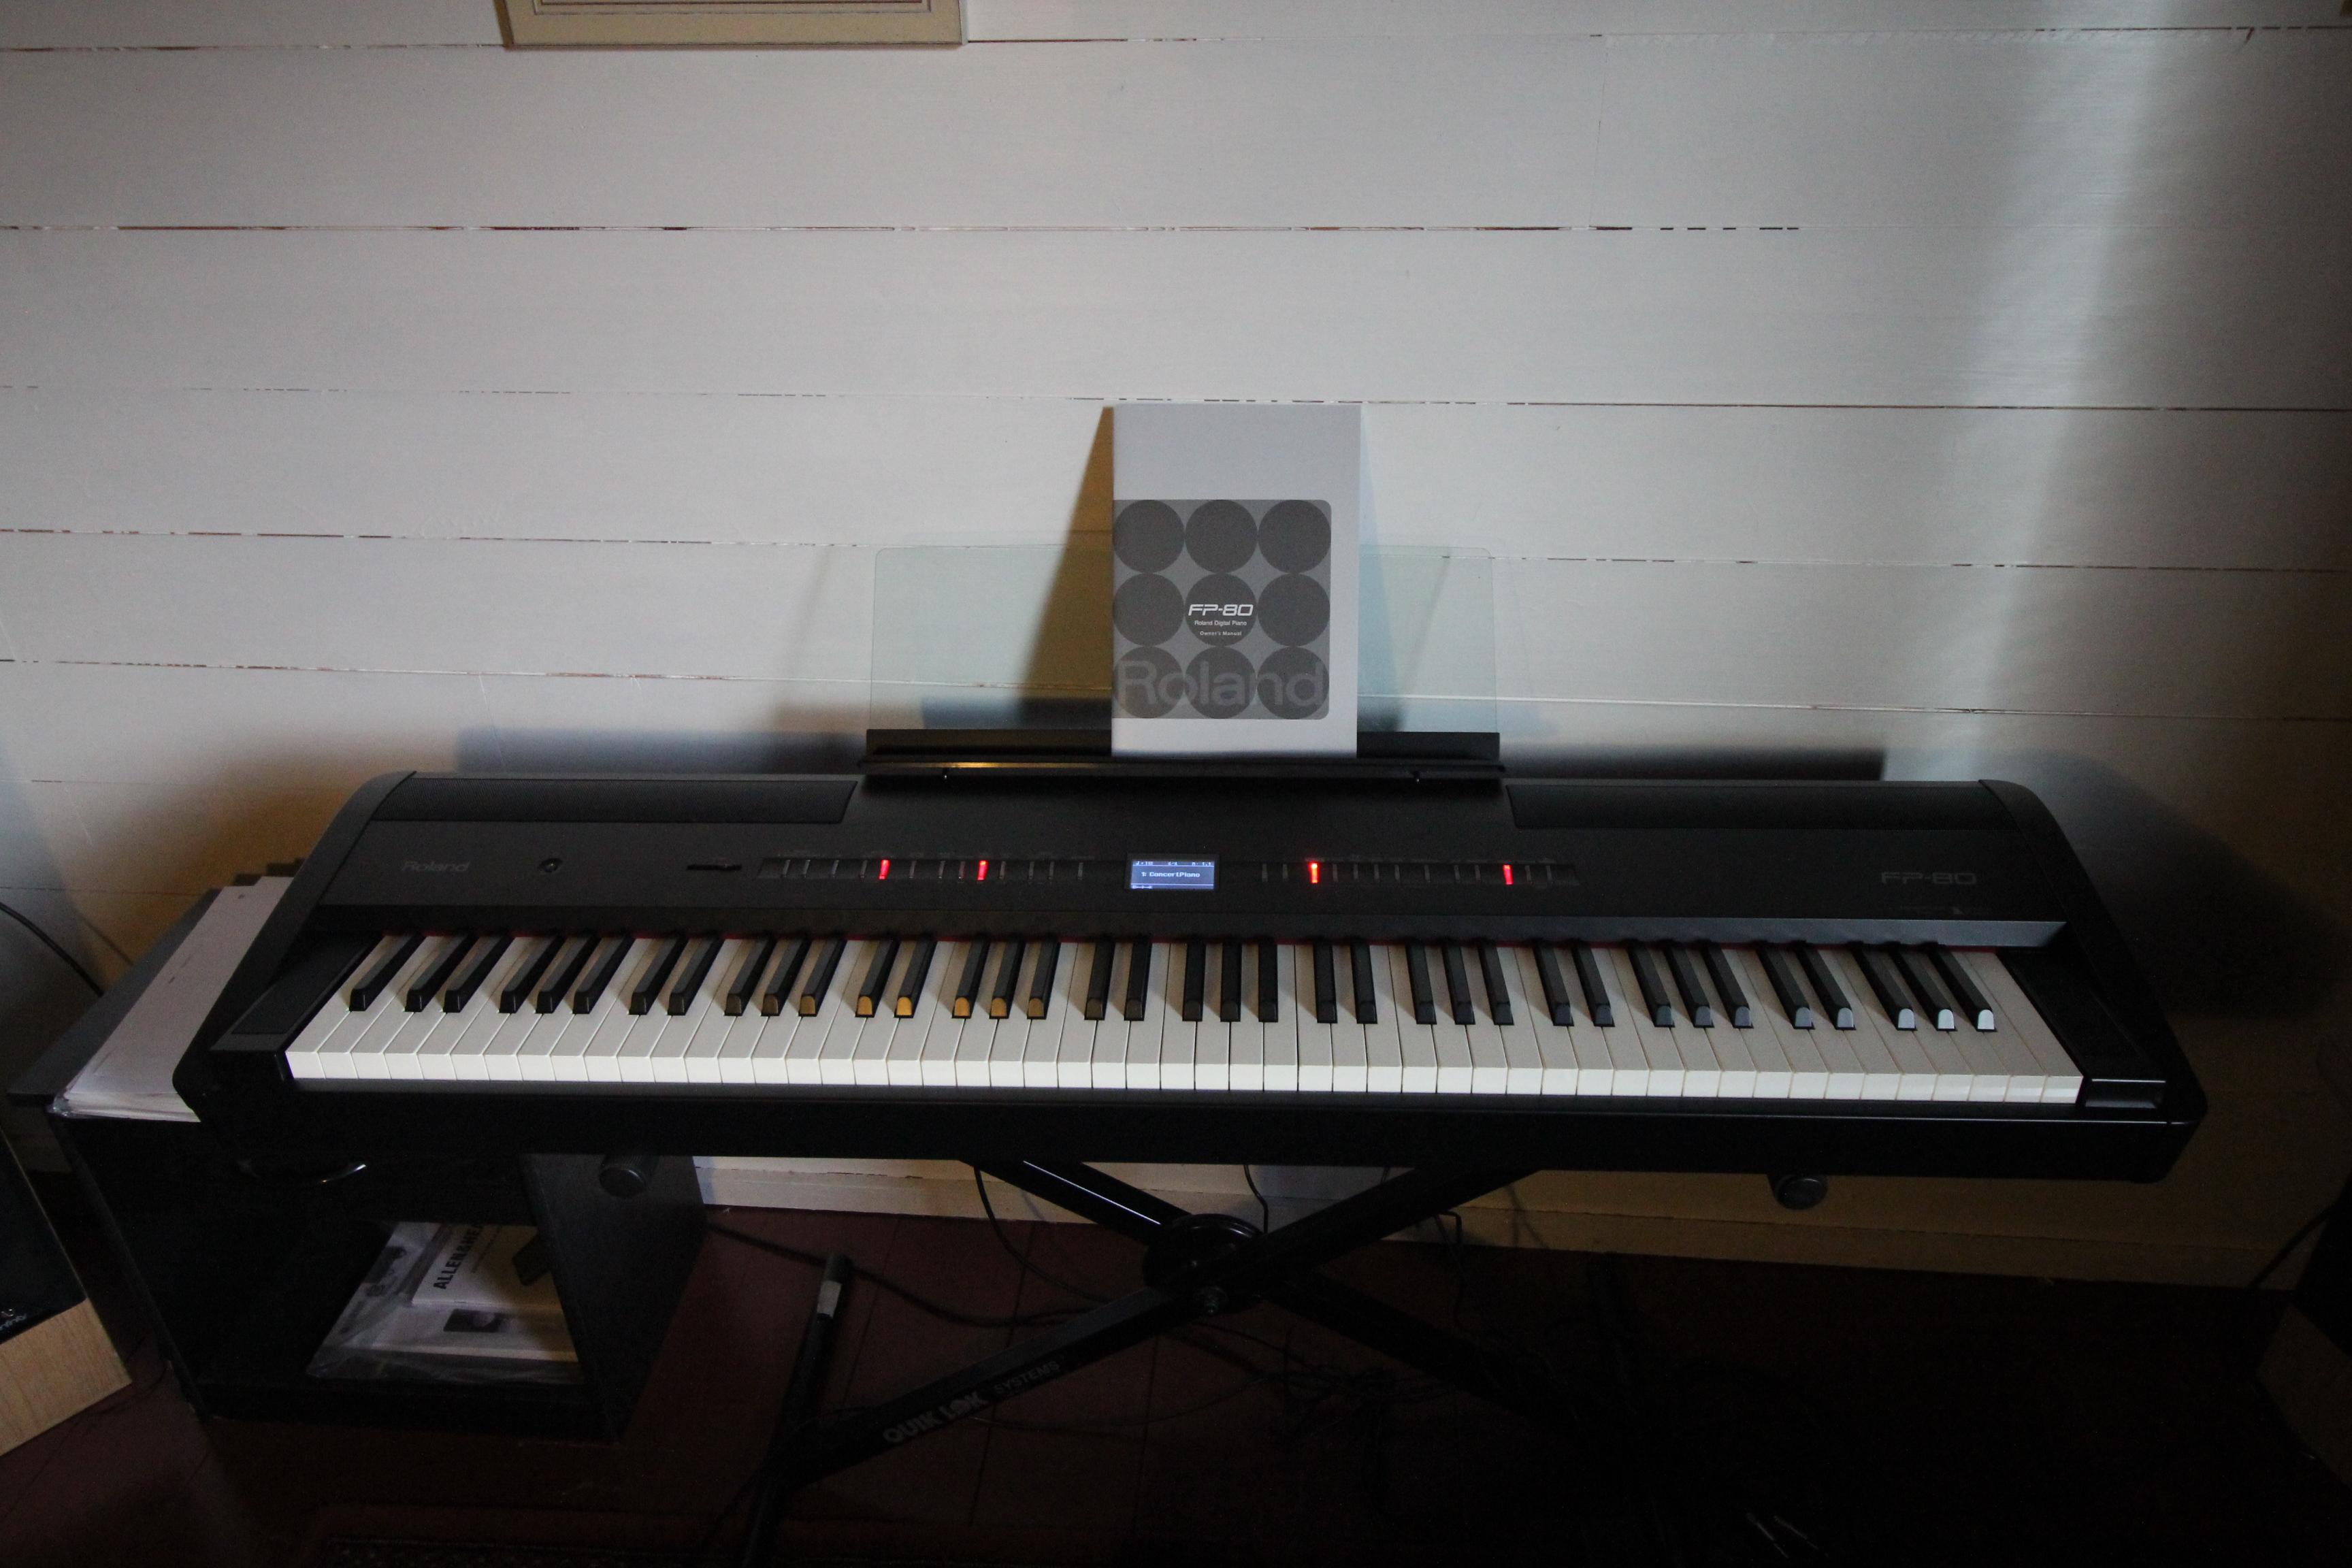 photo roland fp 80 roland fp 80 3303 1346106 audiofanzine. Black Bedroom Furniture Sets. Home Design Ideas